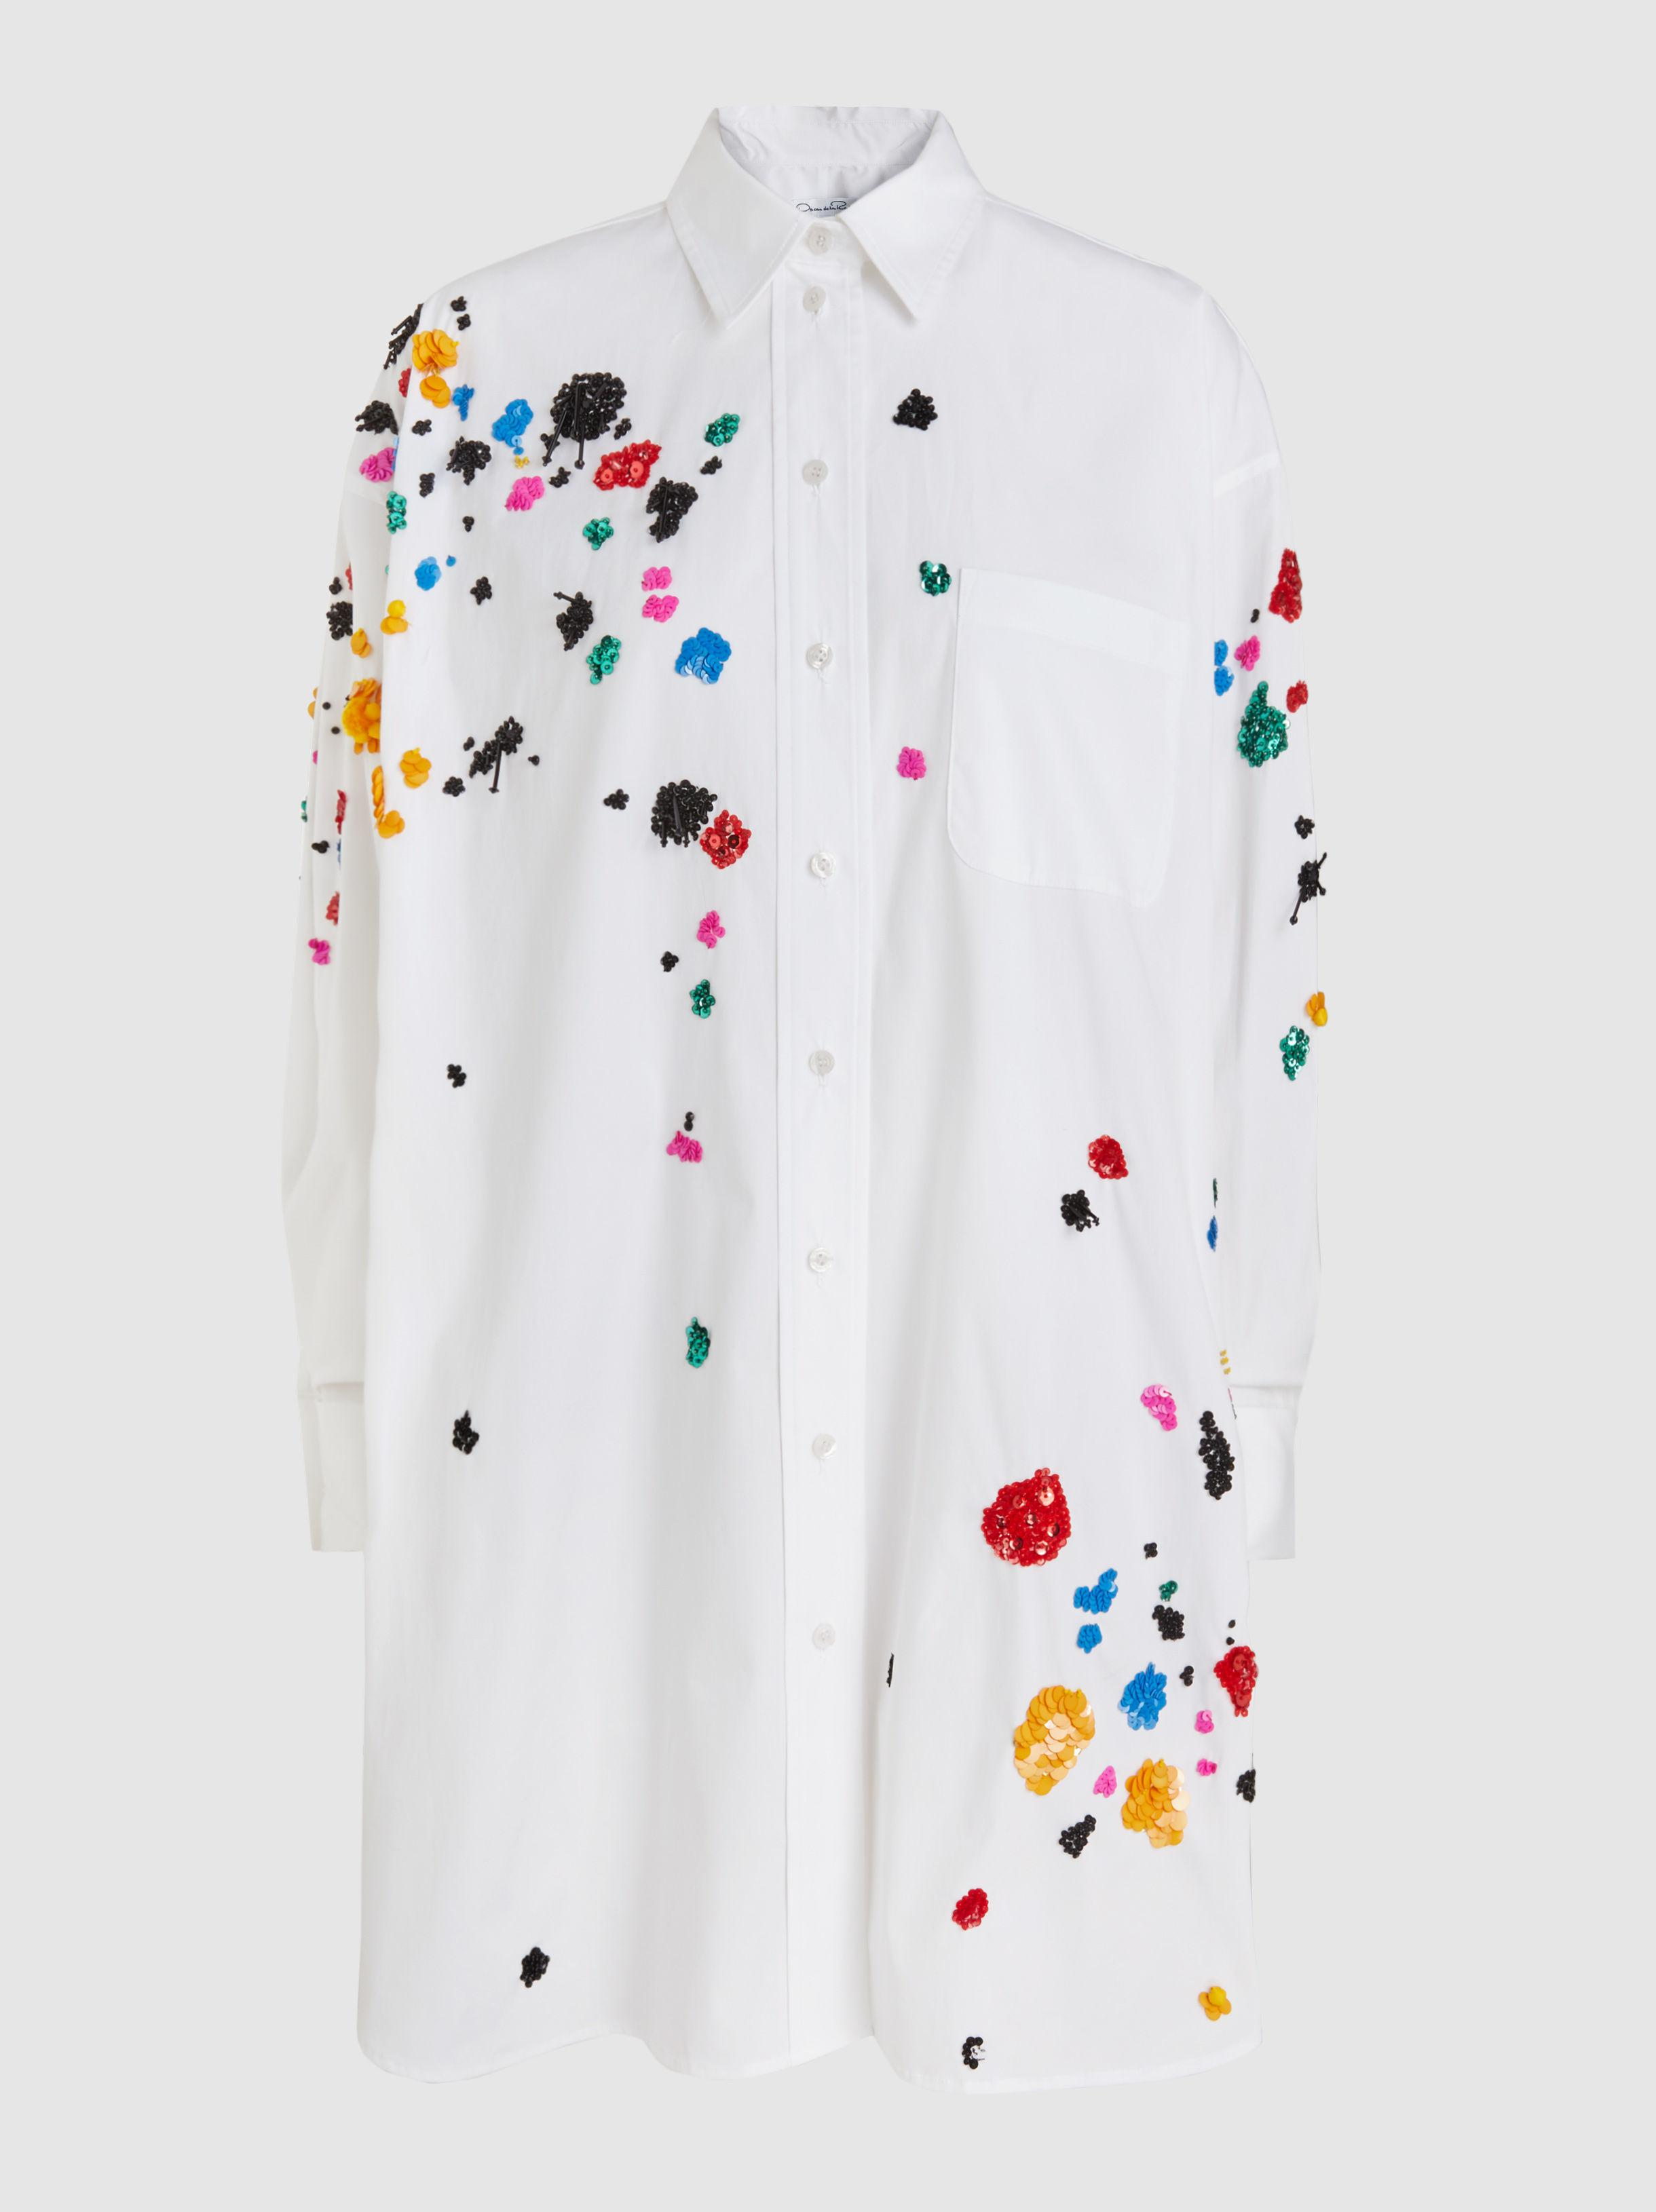 Clearance 100% Original brooch embellished pleated shirt - White Oscar De La Renta Discounts Sale Online New Arrival Cheap Price iYDvfG4SPL